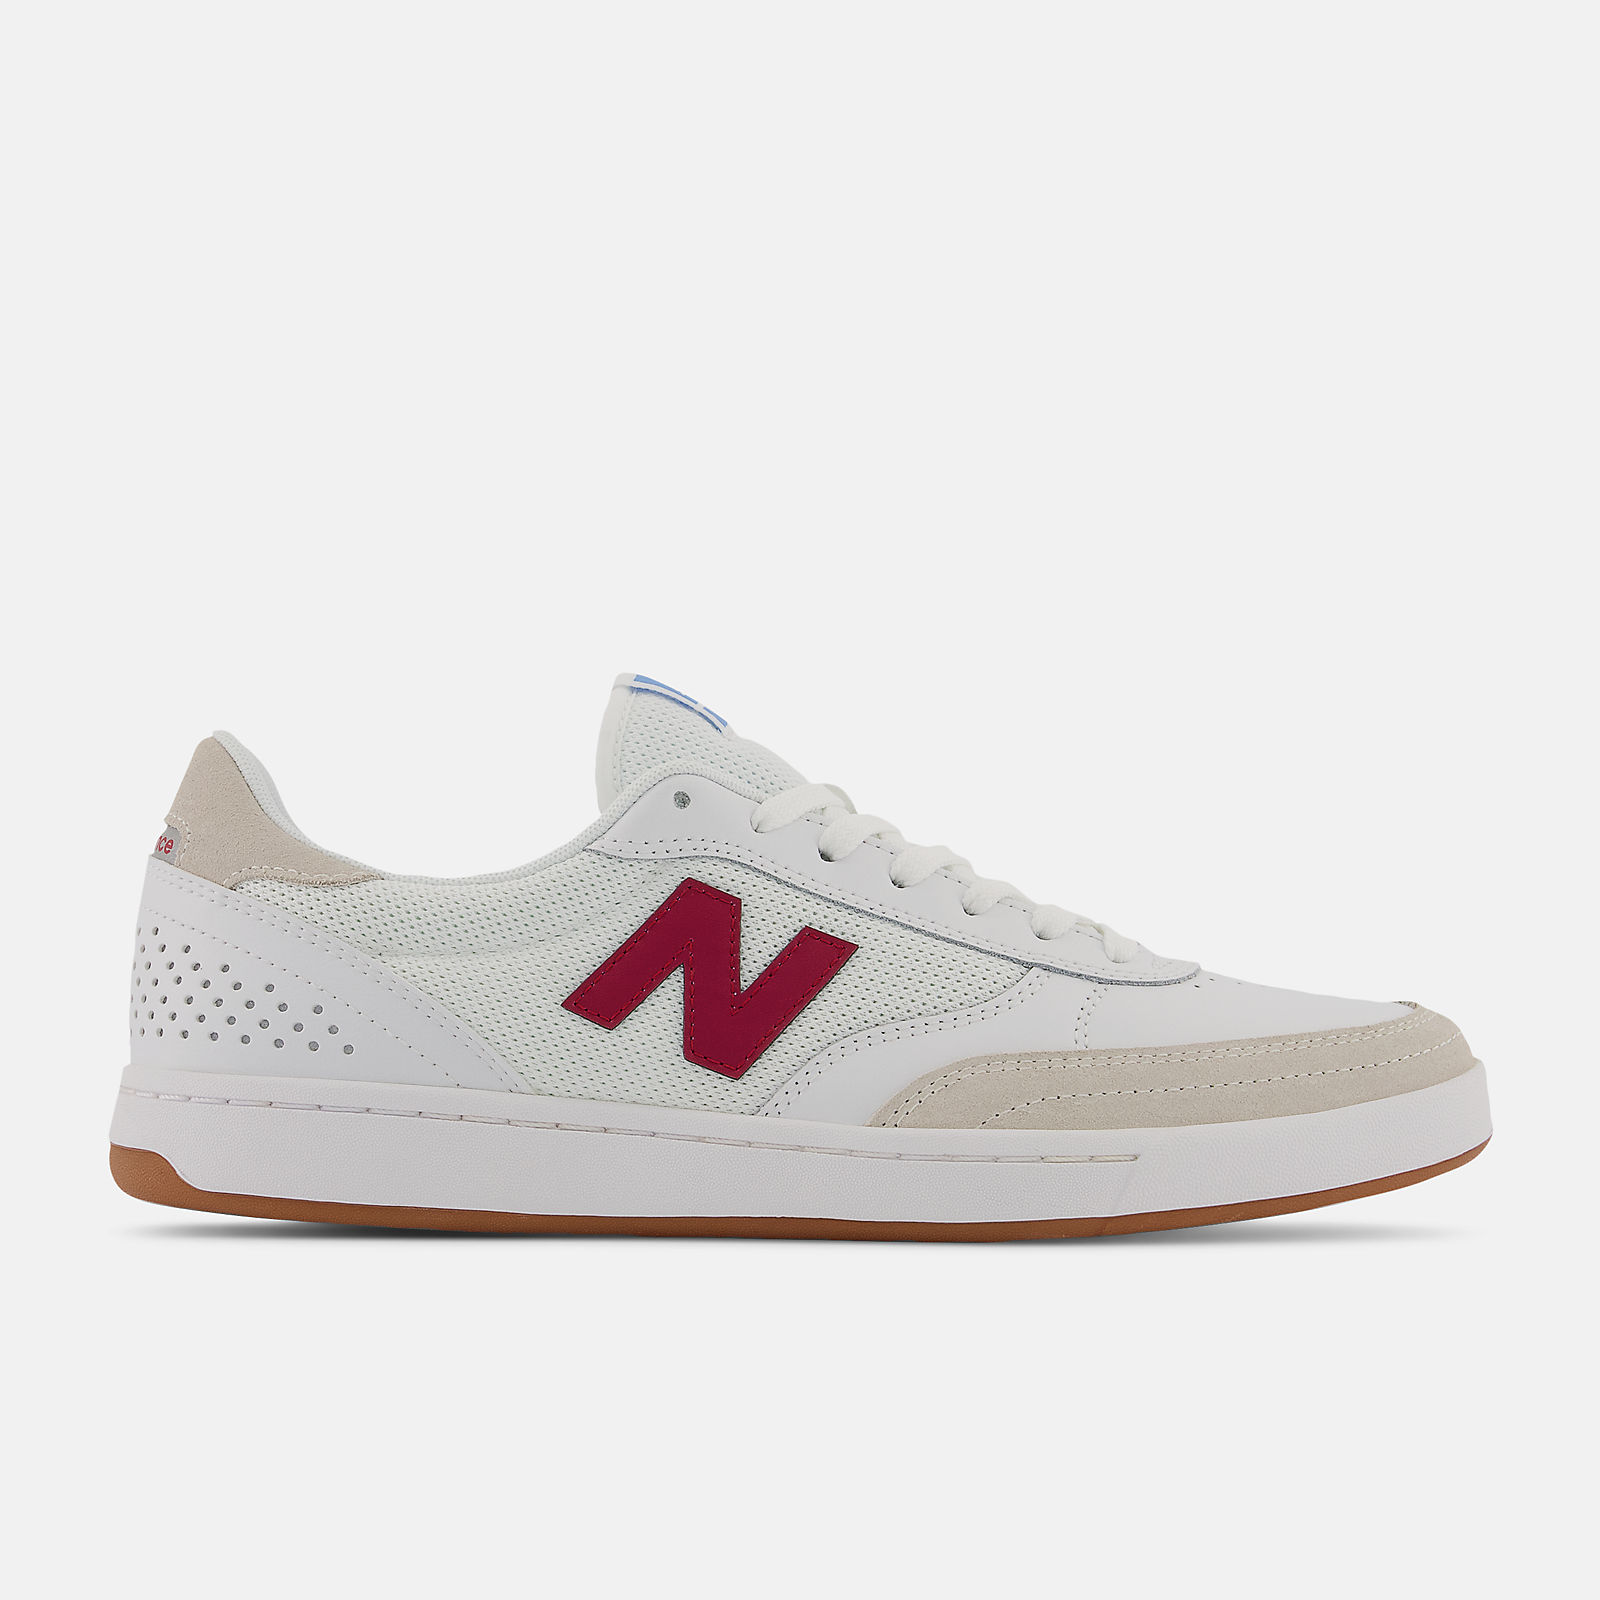 Numeric 440 - New Balance